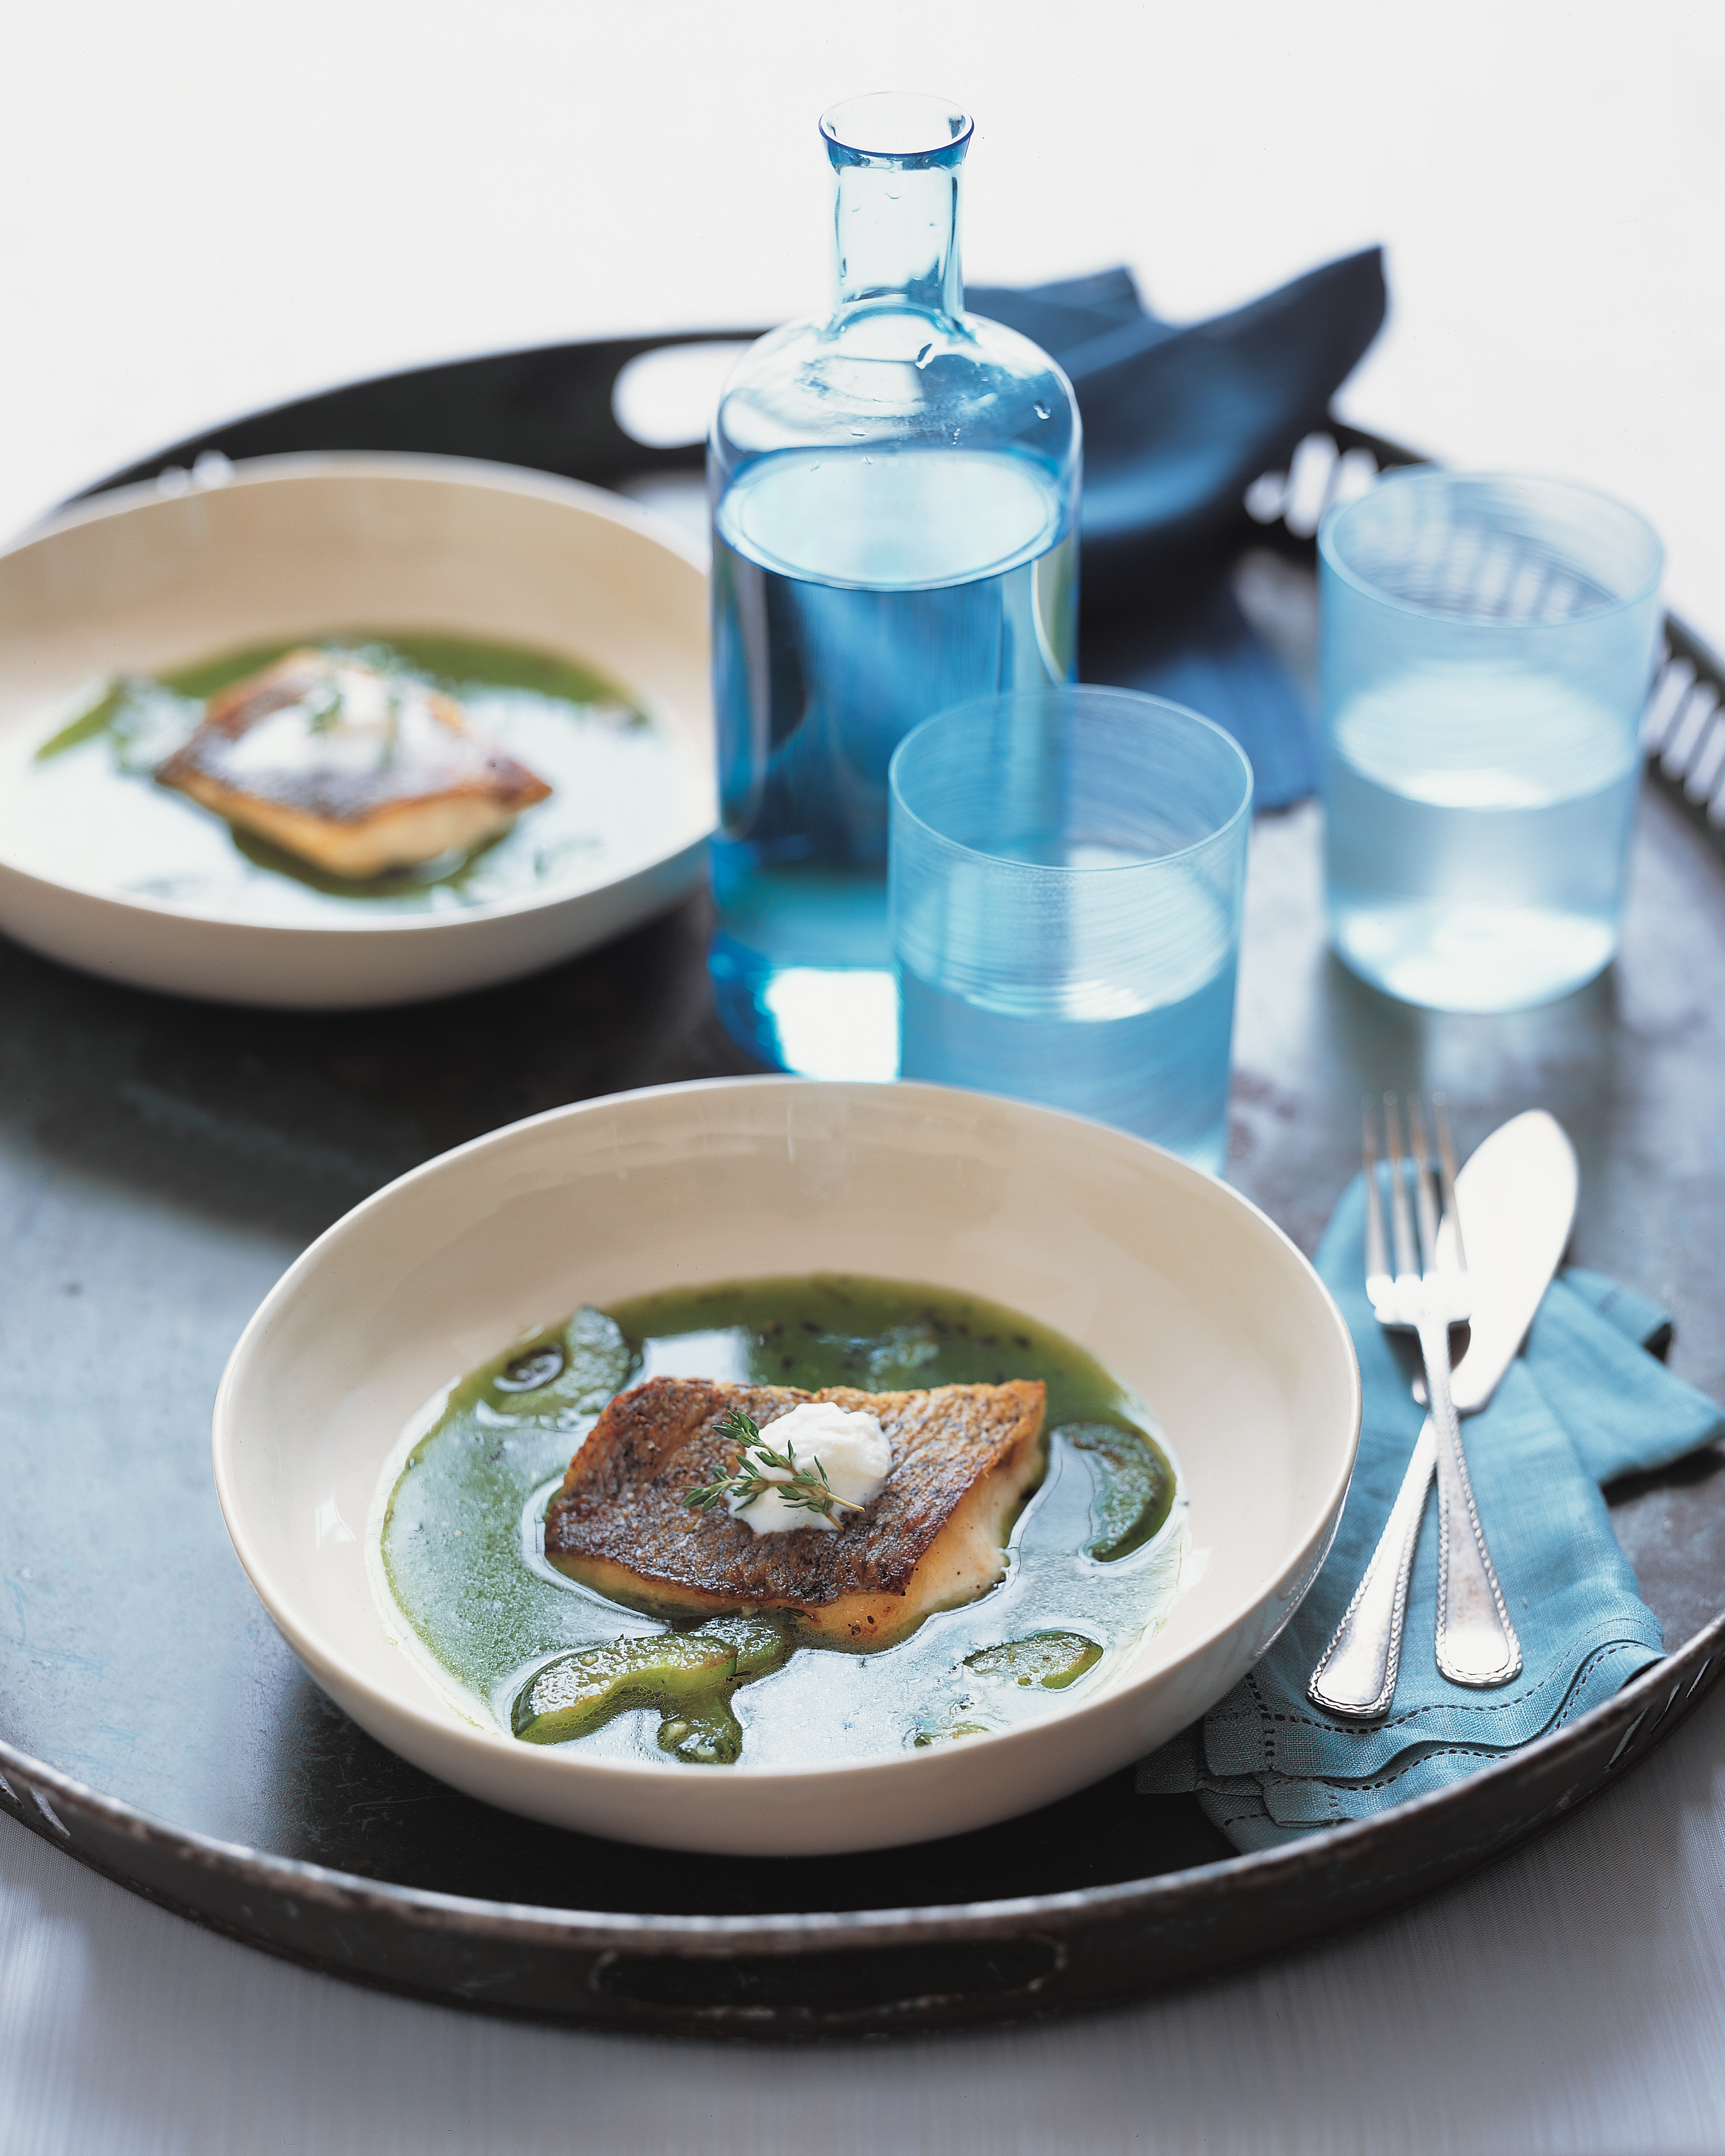 Grilled Striped Bass Recipes Barefoot Contessa grilled striped bass | martha stewart